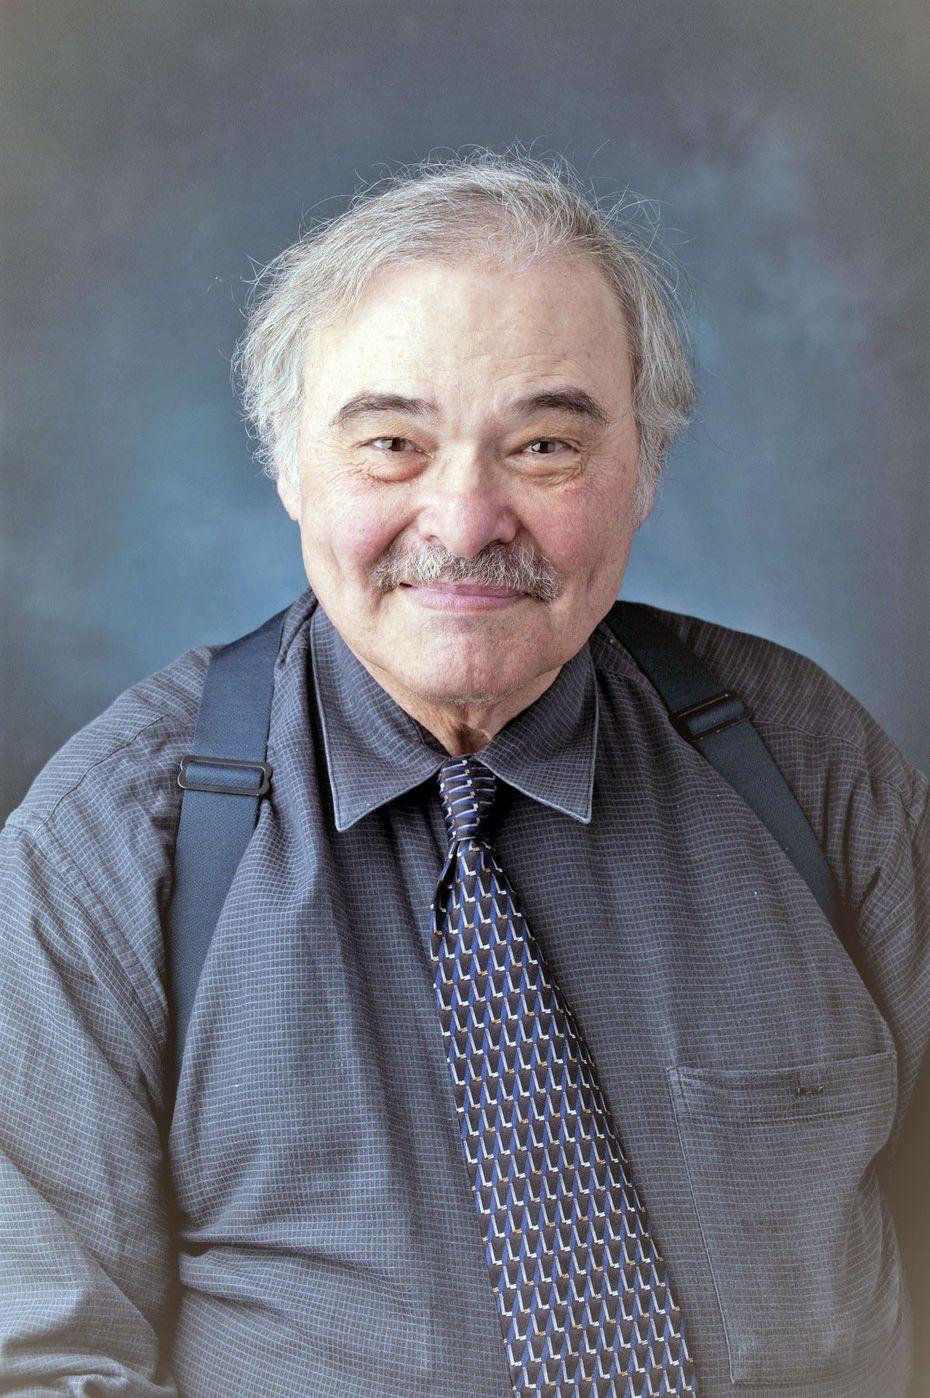 Dr. Allan Naarden, a neurologist at Medical City Dallas.